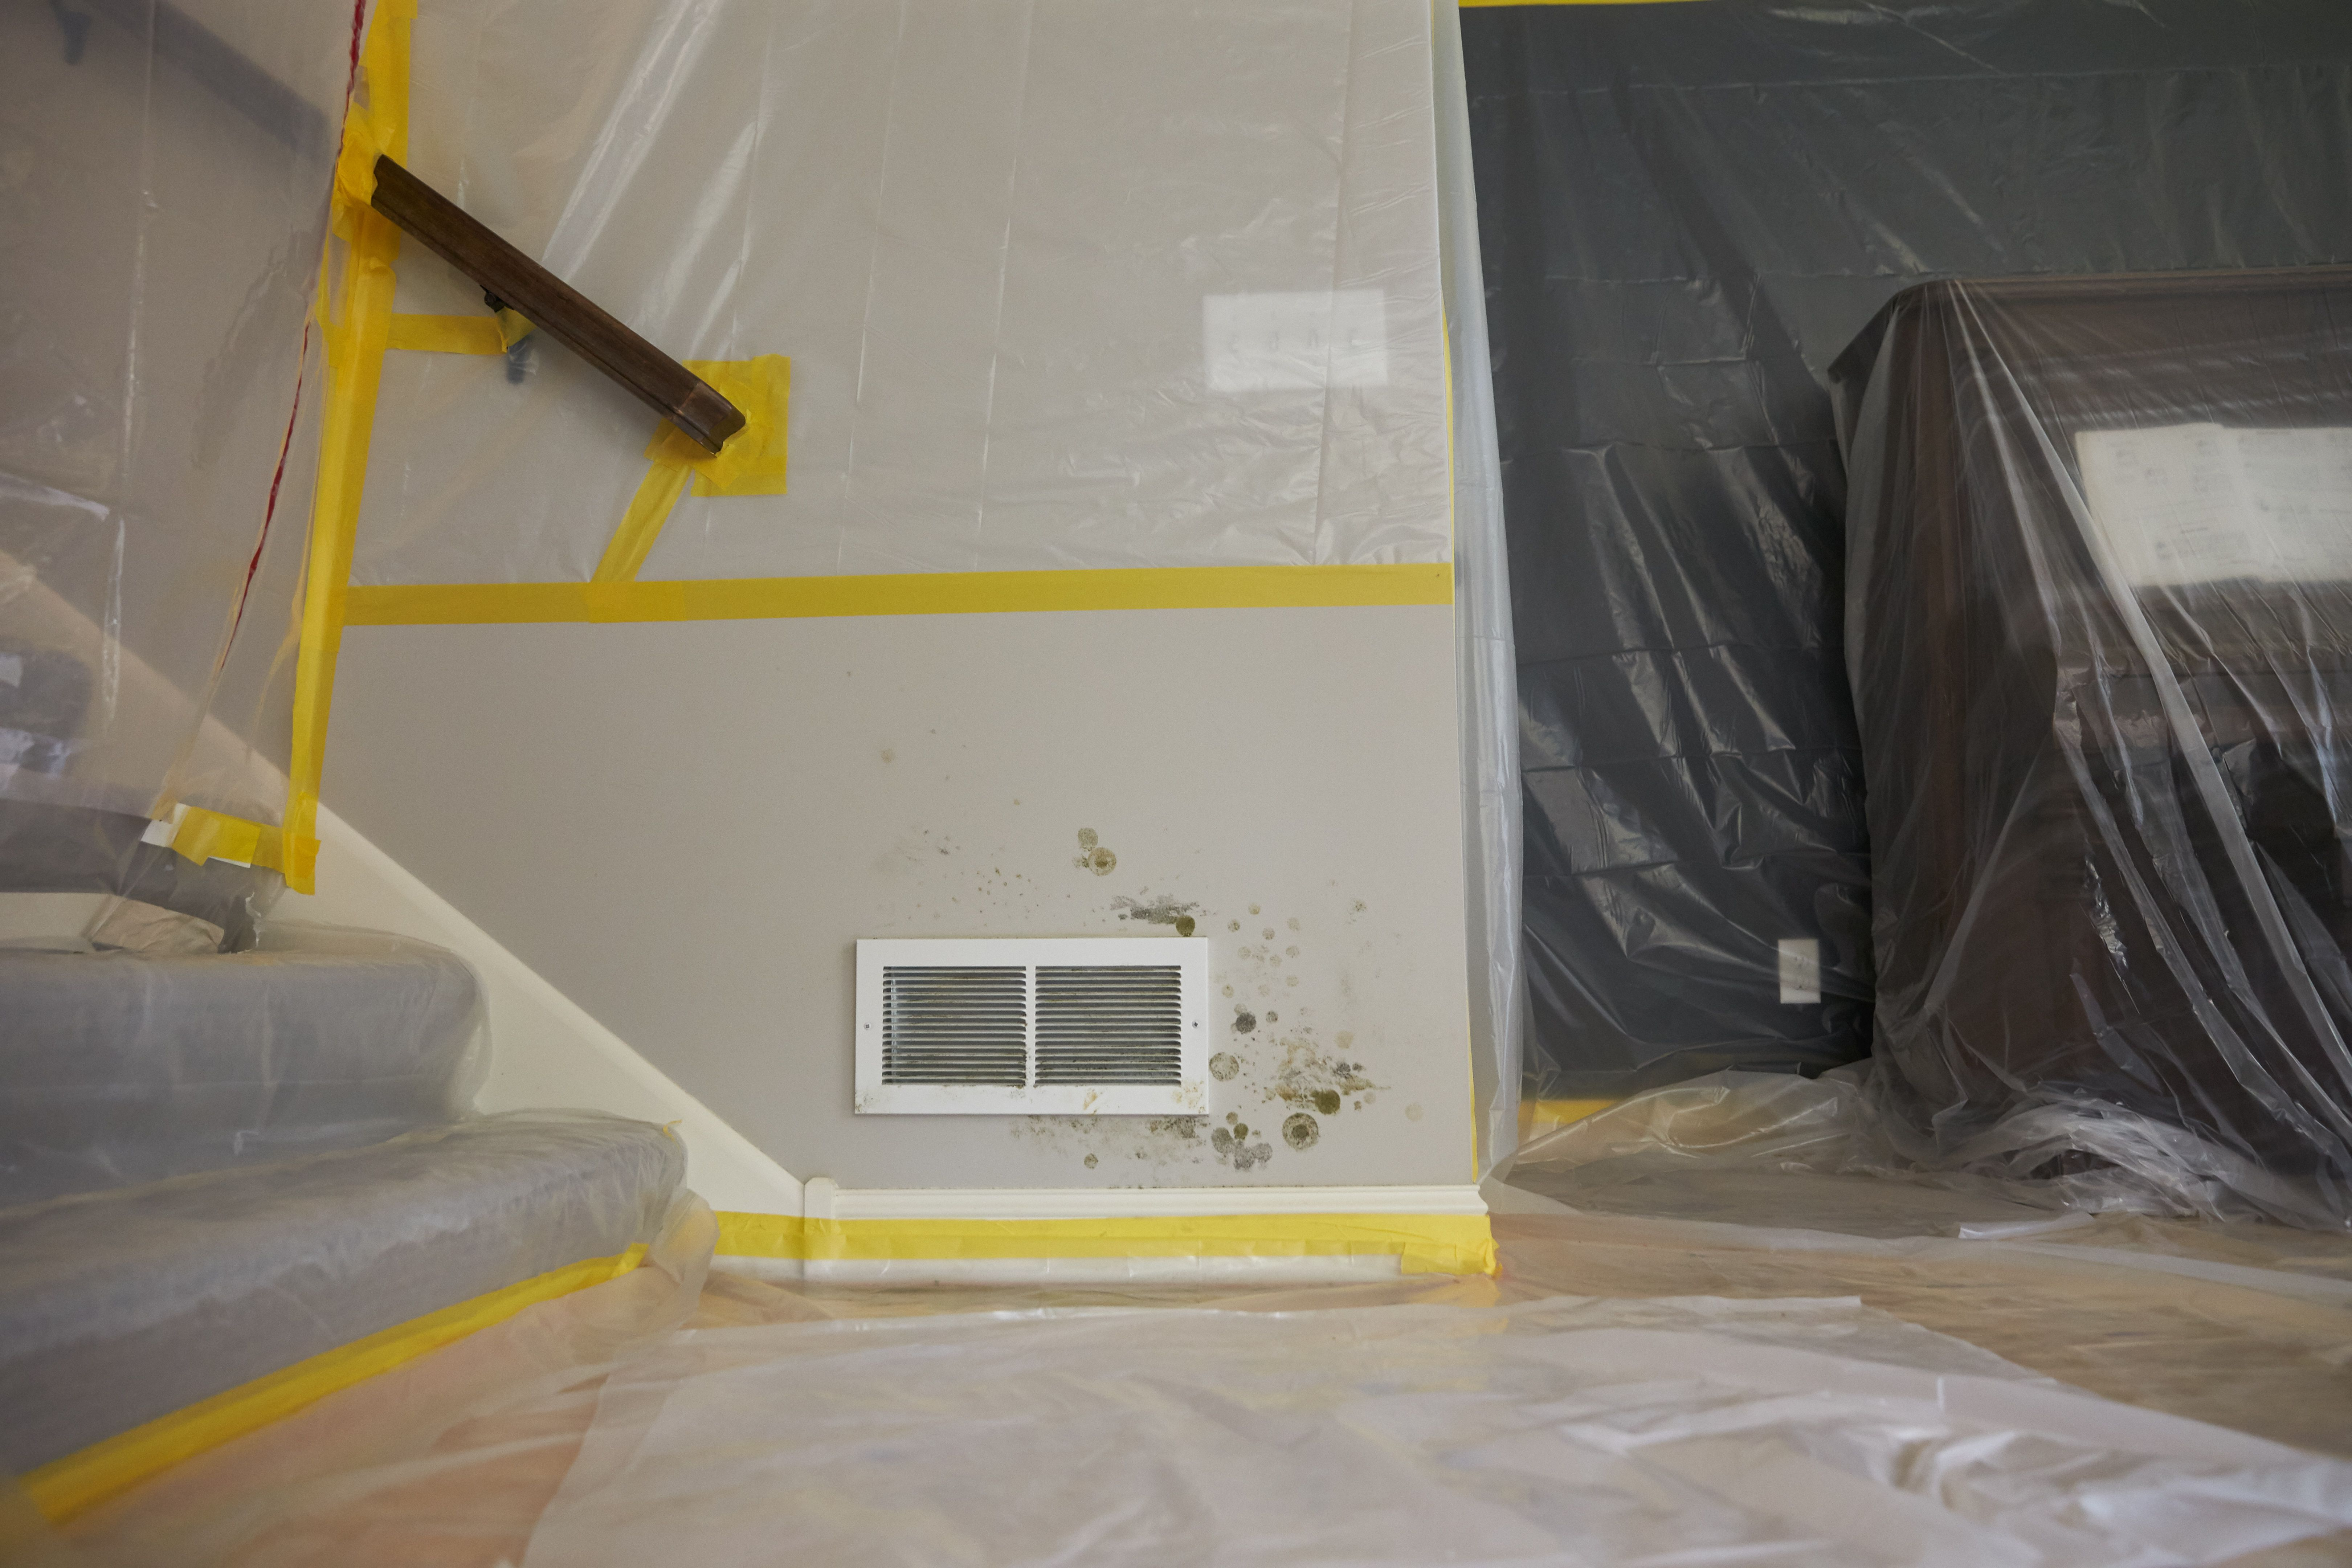 Mold Remediation In Sandy Springs Ga Mold Remediation Damage Restoration Diy Mould Removal